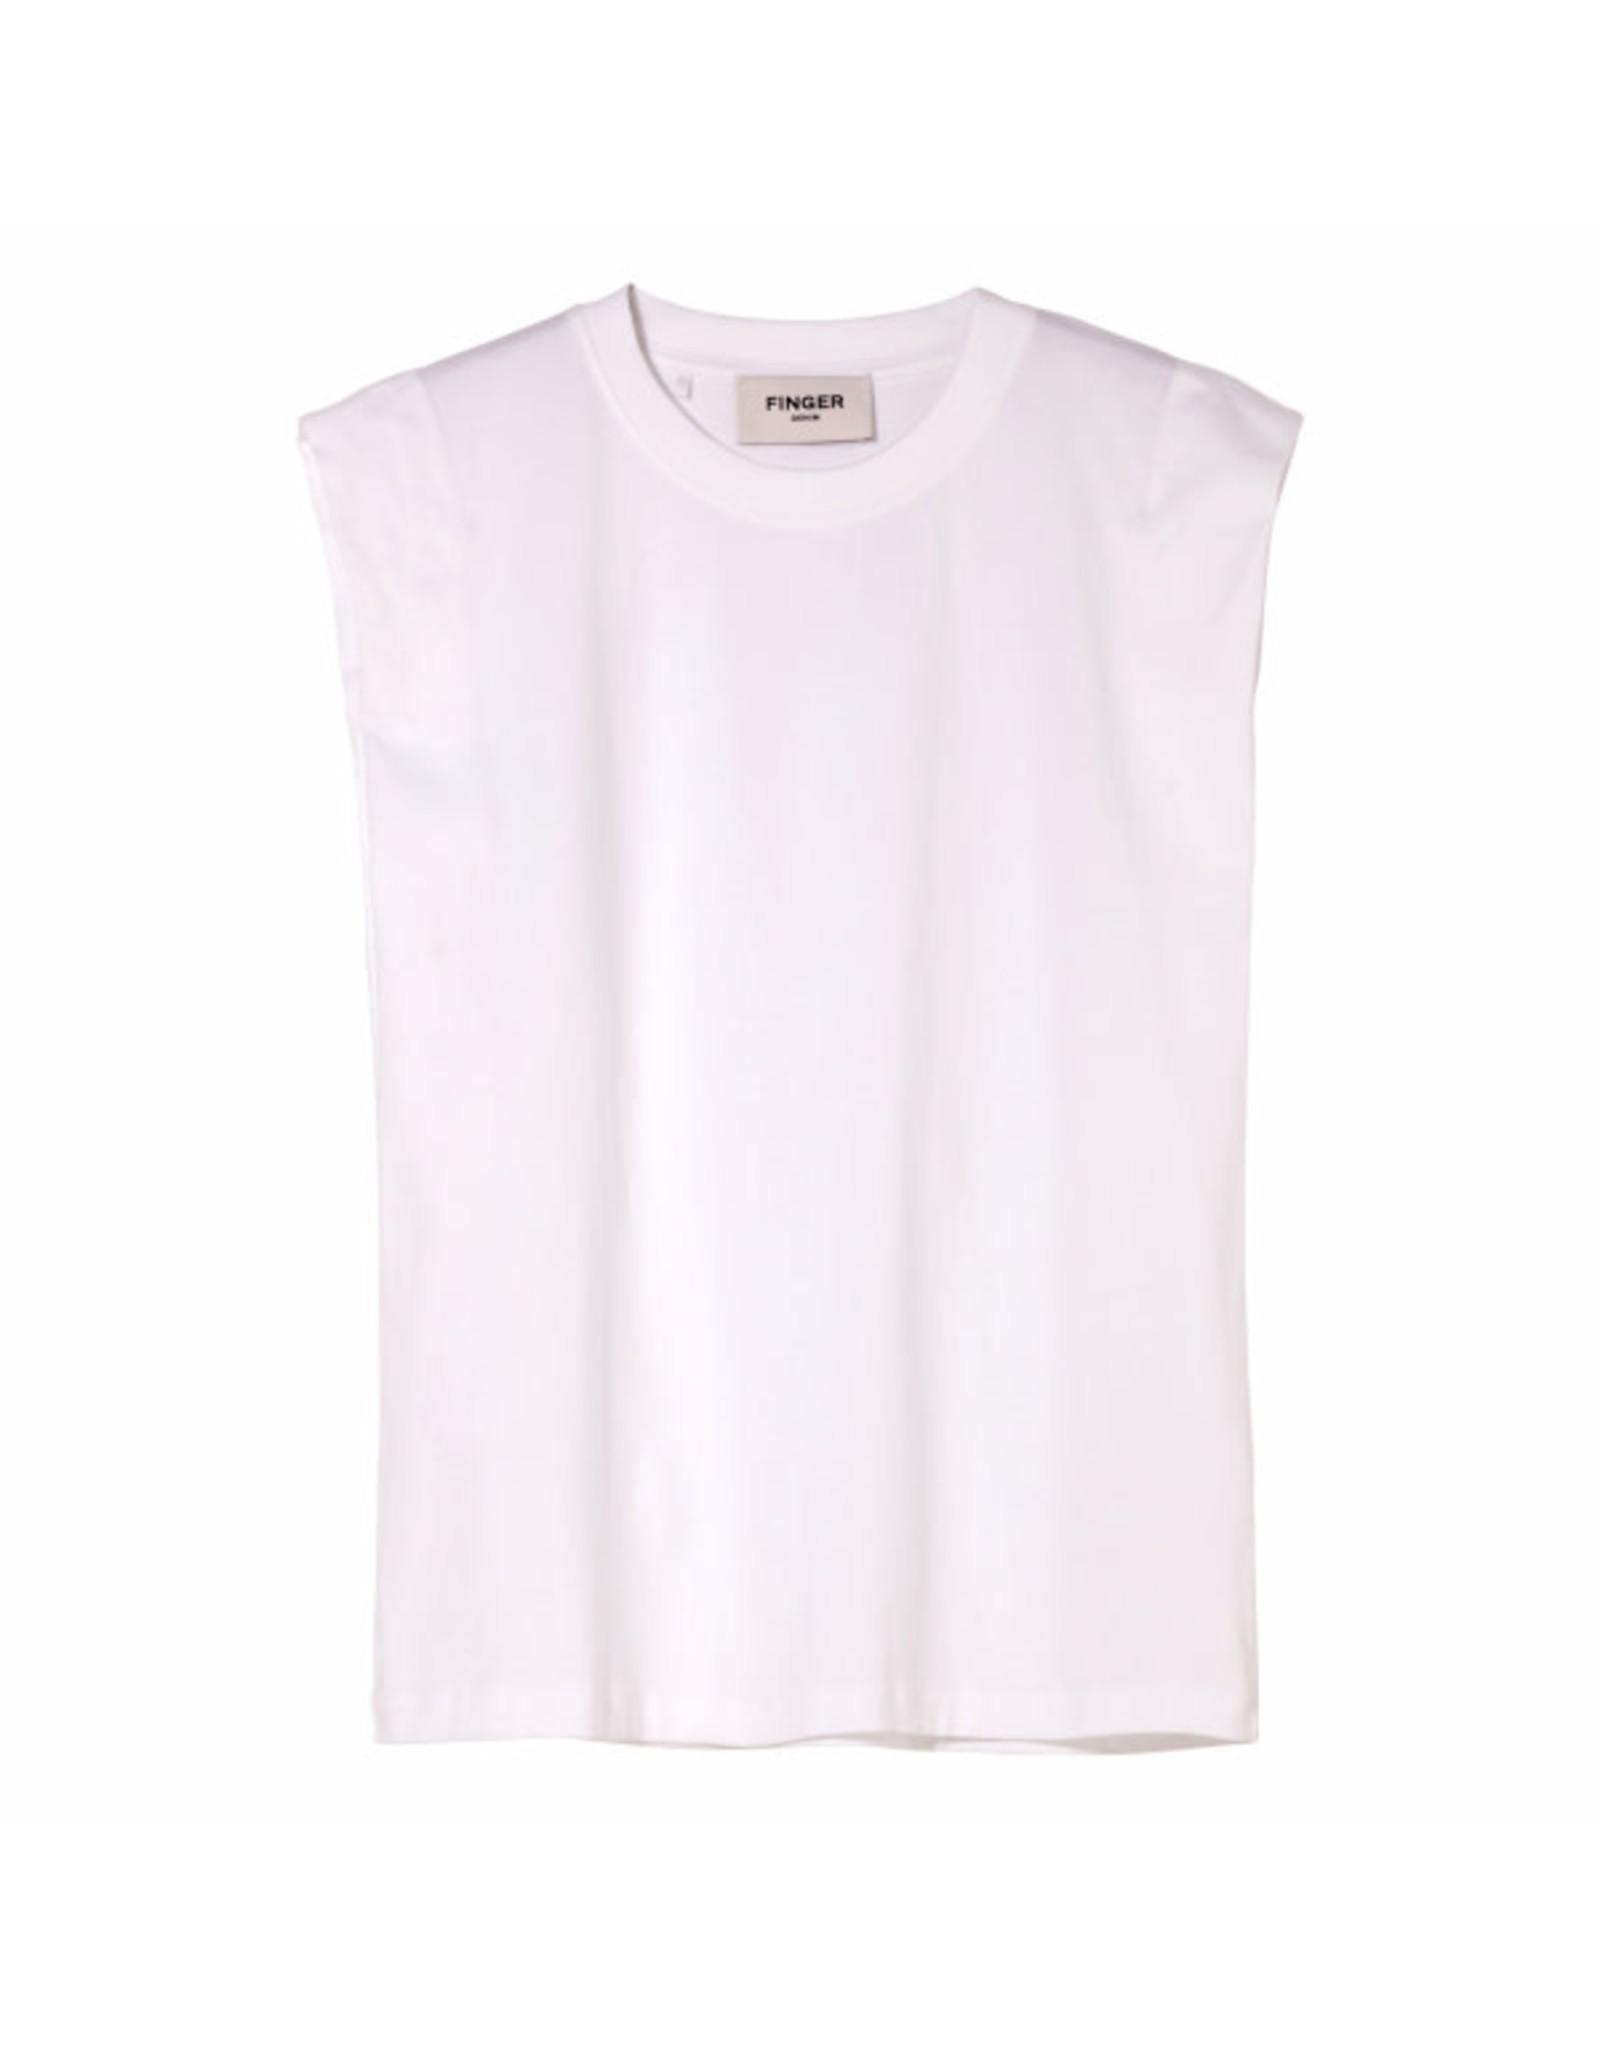 FITN SS21 SC003 shirt